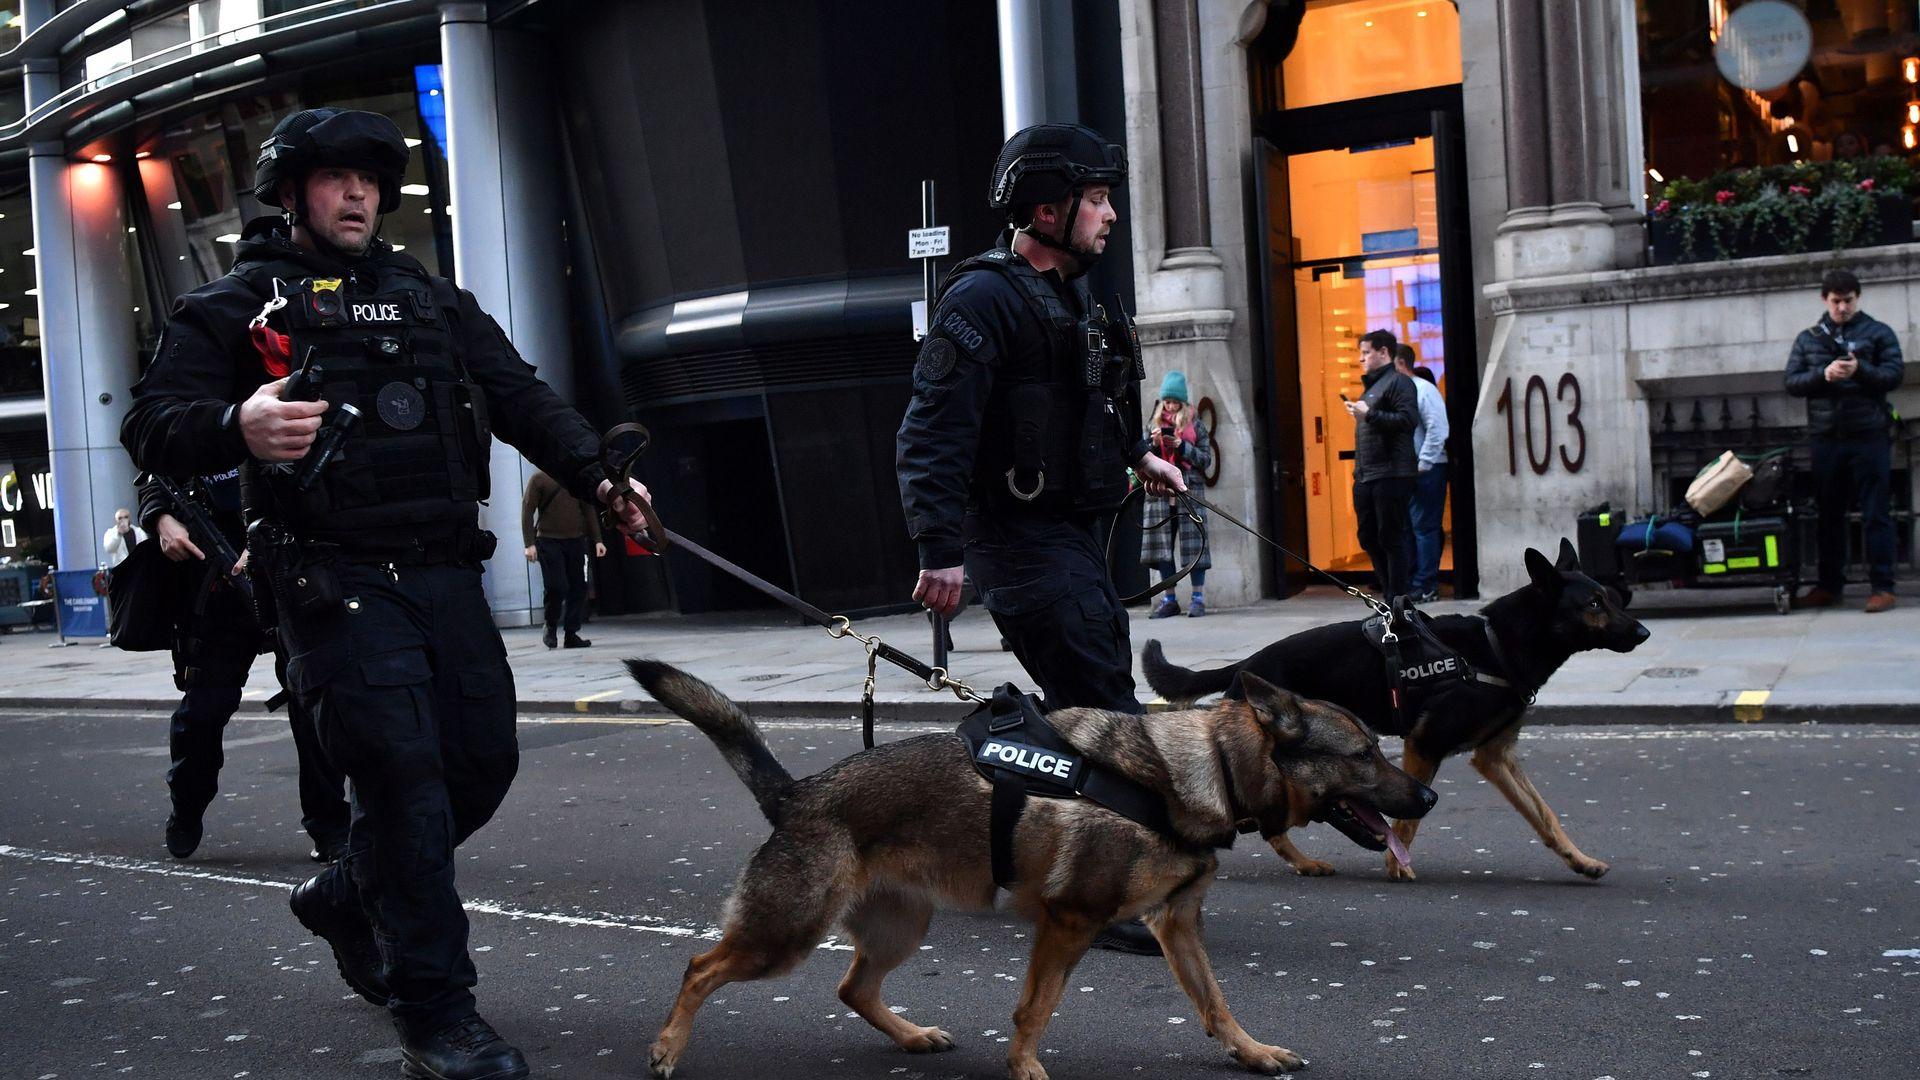 Armed police respond to a stabbing near London Bridge